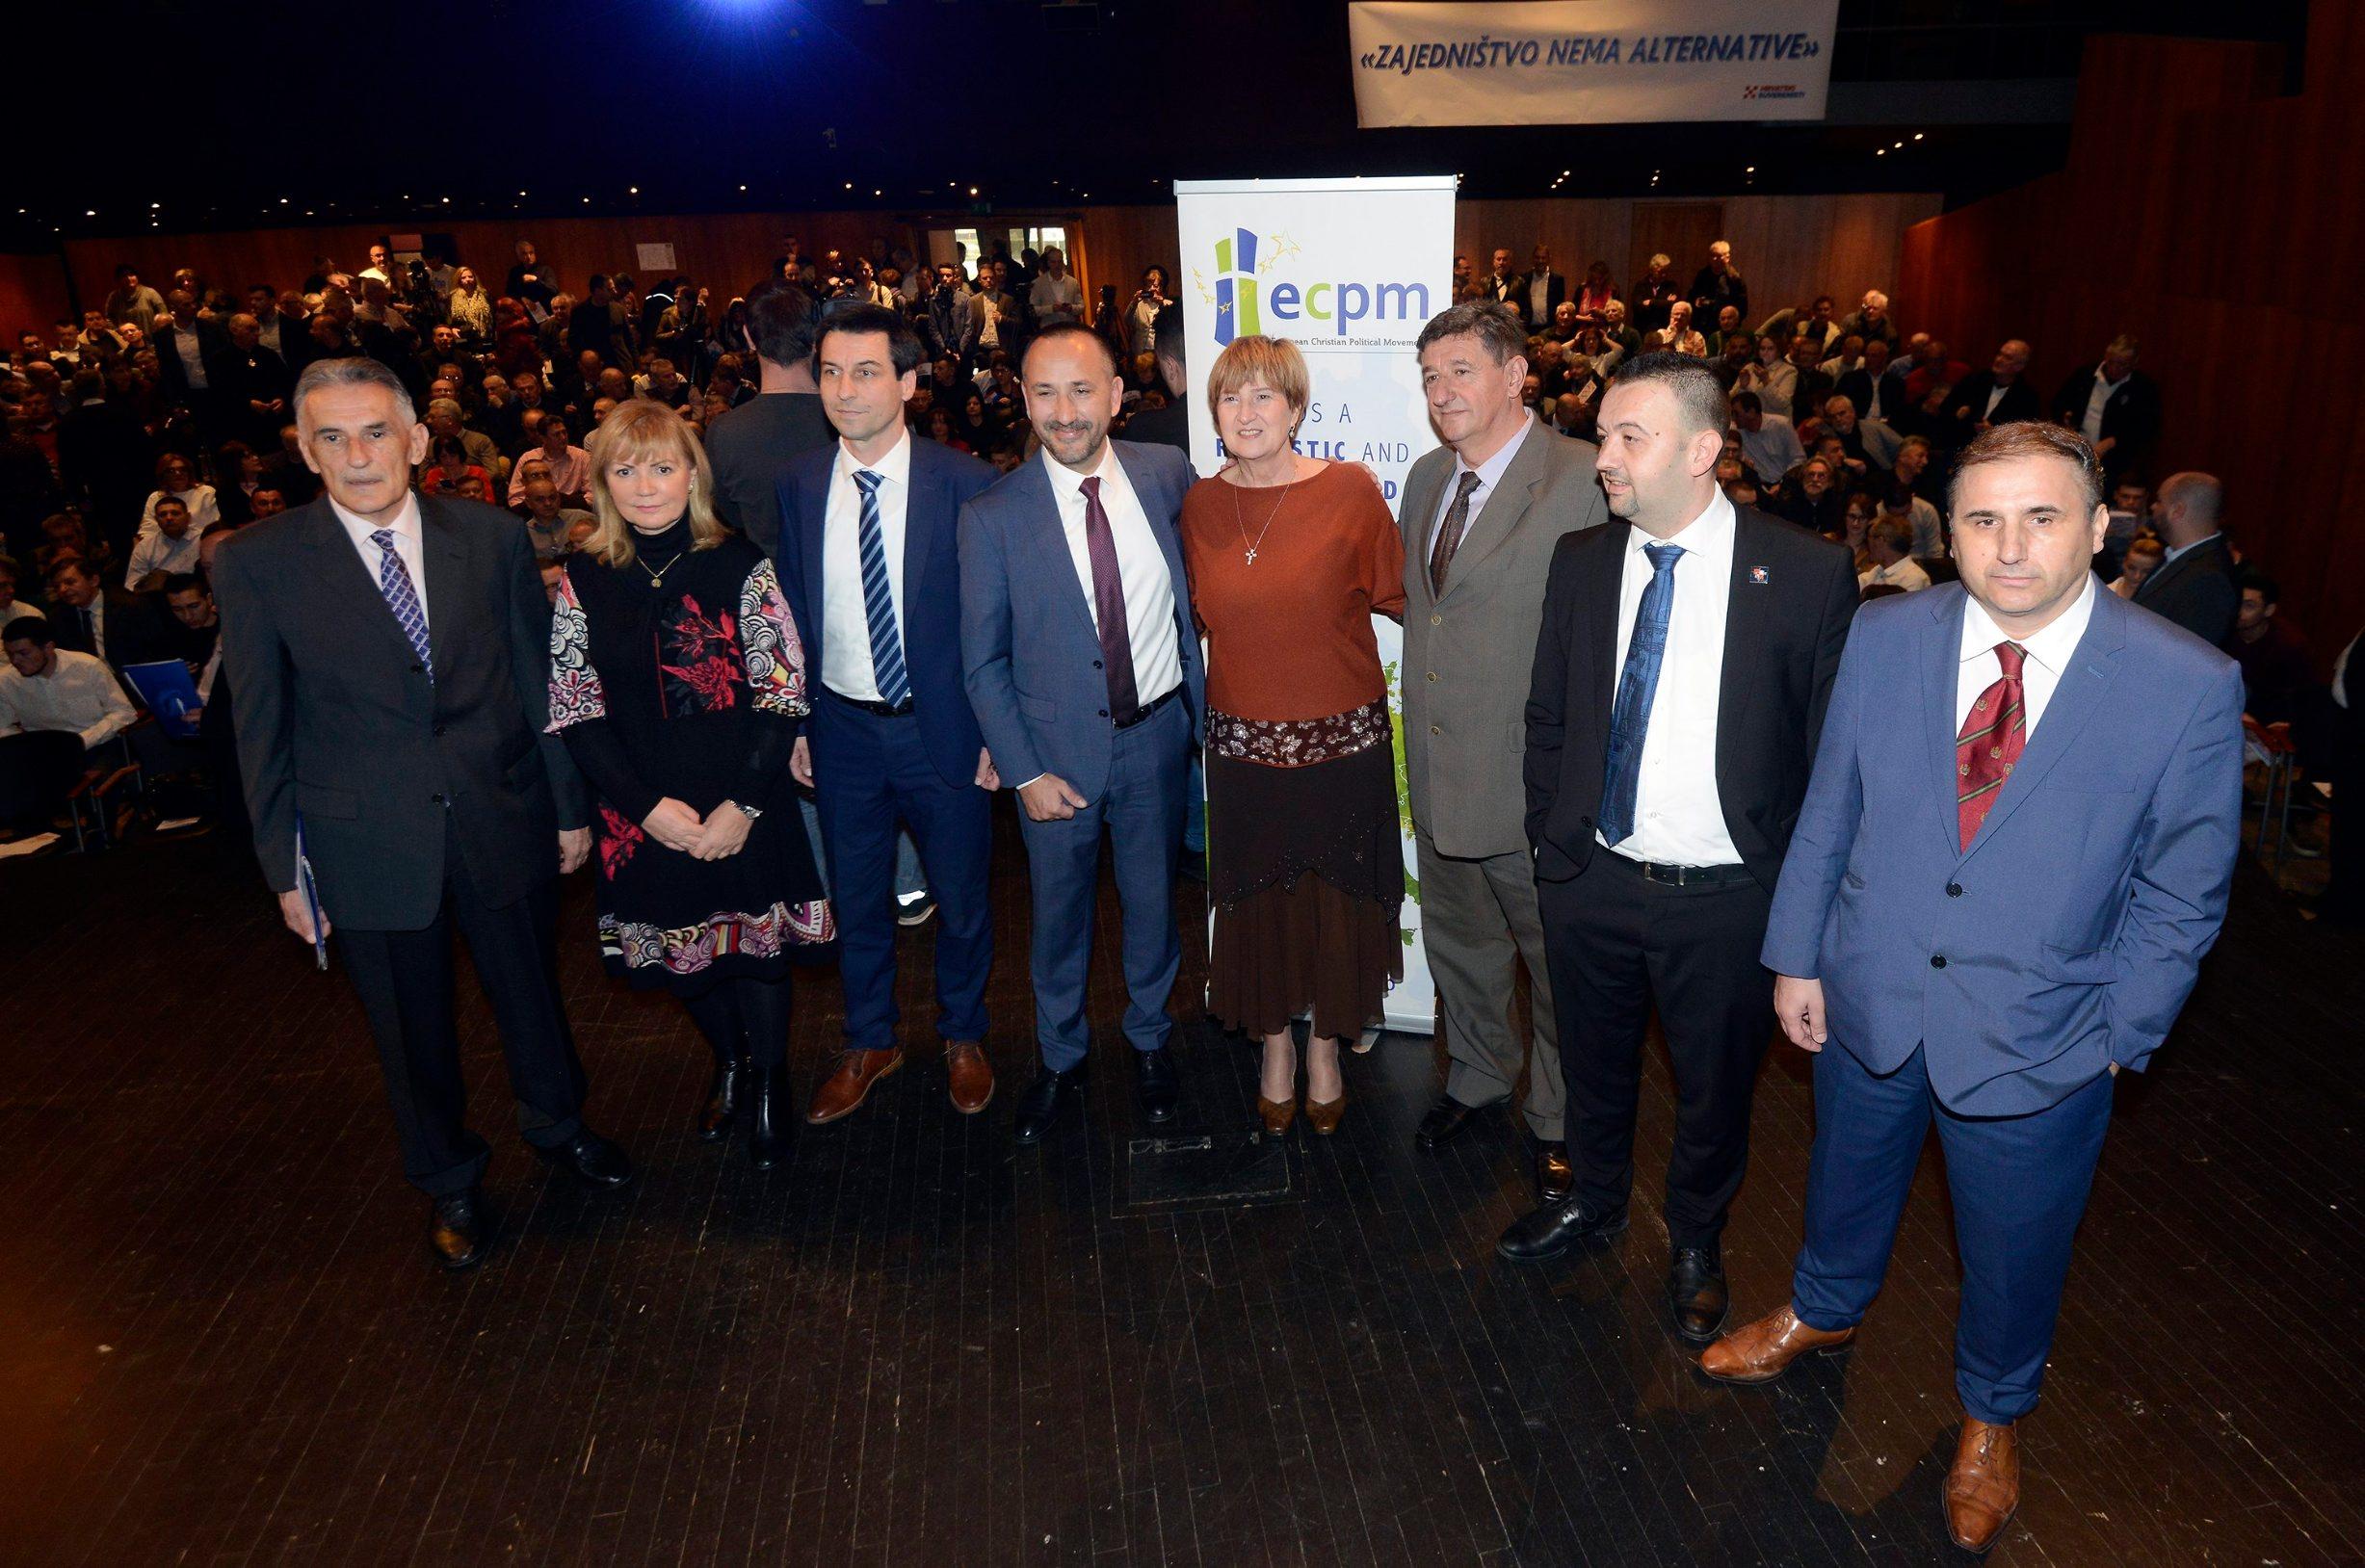 Pero Kovačević, Bernardica Juretić Rožman, Ladislav Ilčić, Hrvoje Zekanović, Ruža Tomašić, Željko Sačić, Marijan Pavliček, Jure Vujić